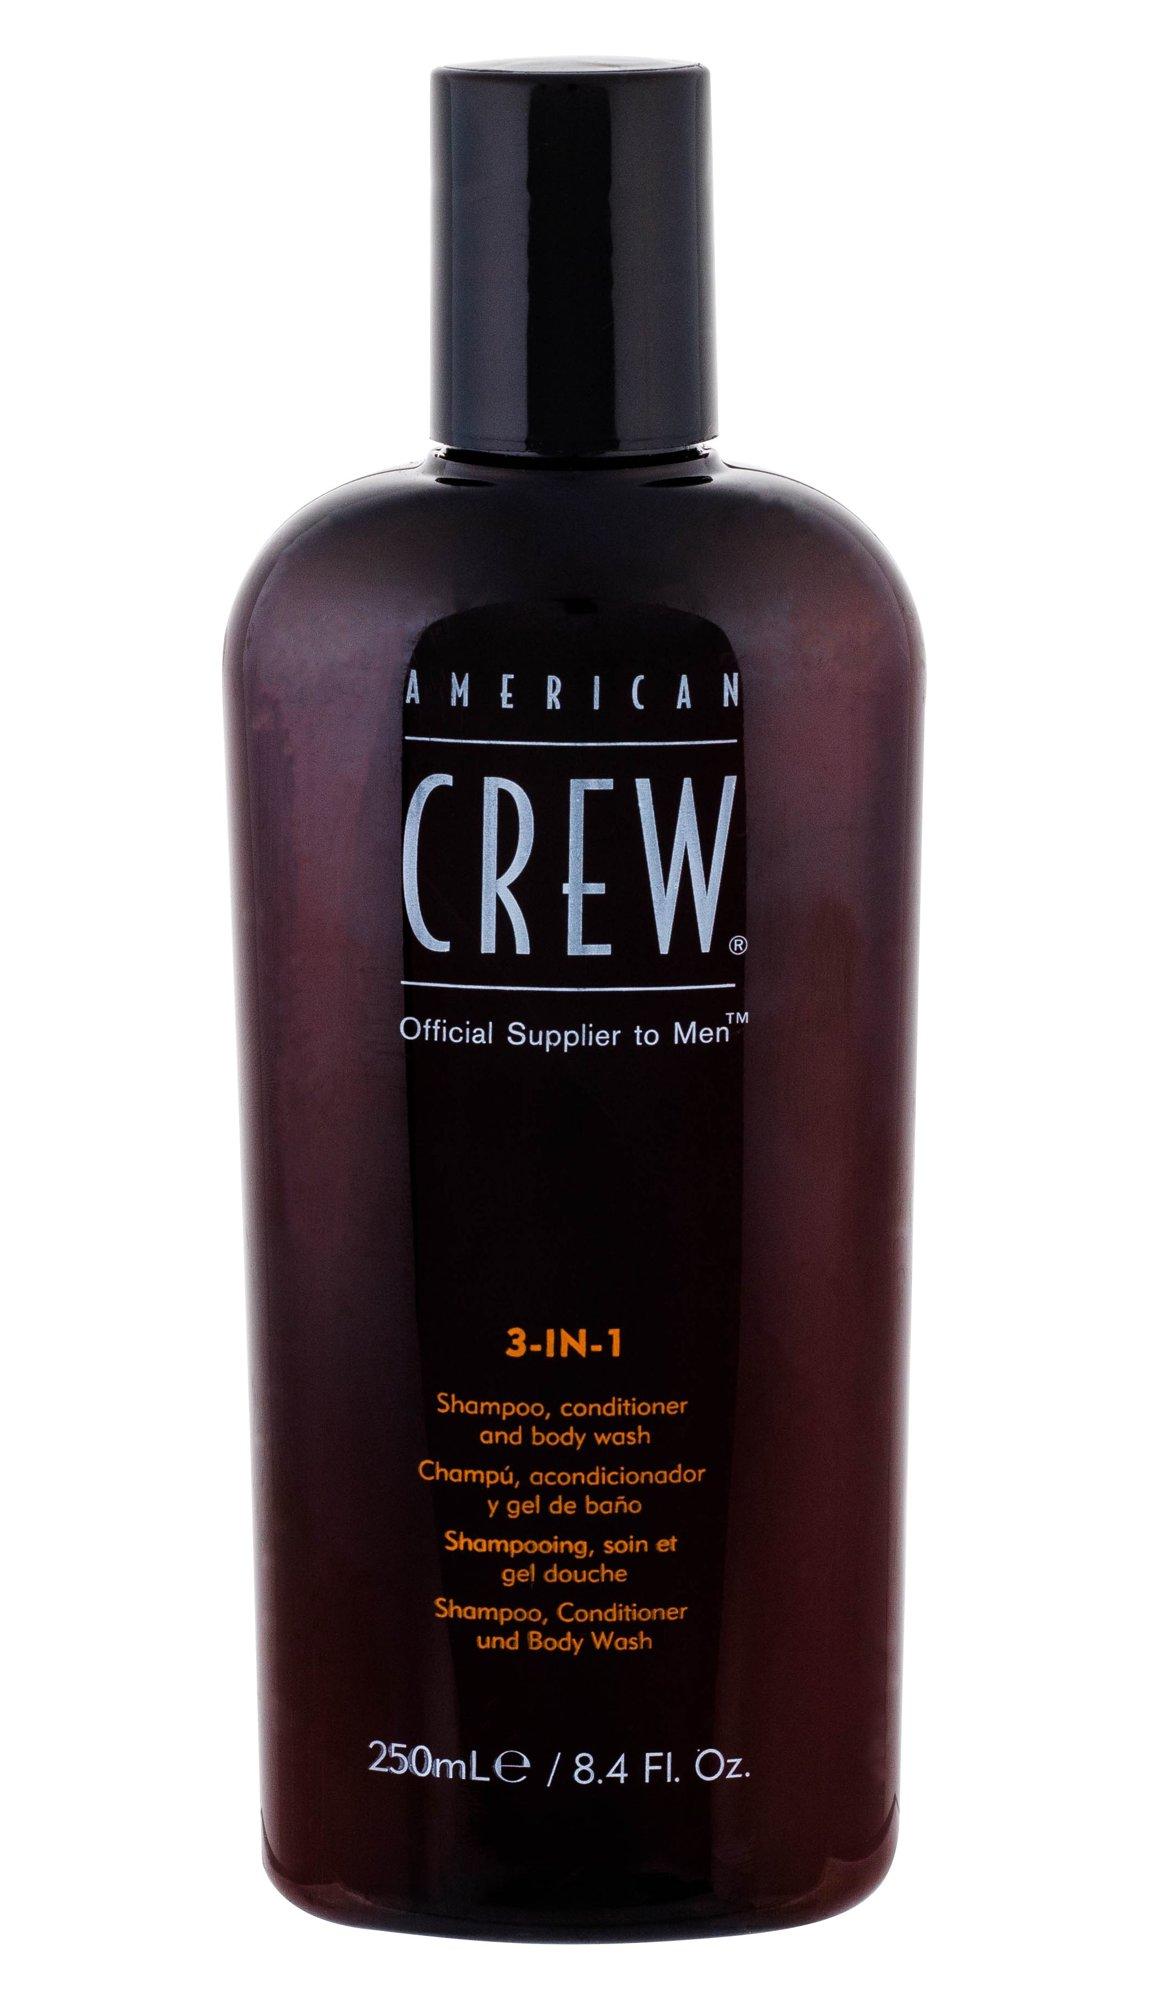 American Crew 3-IN-1 Shampoo, Conditioner & Body Wash Cosmetic 250ml